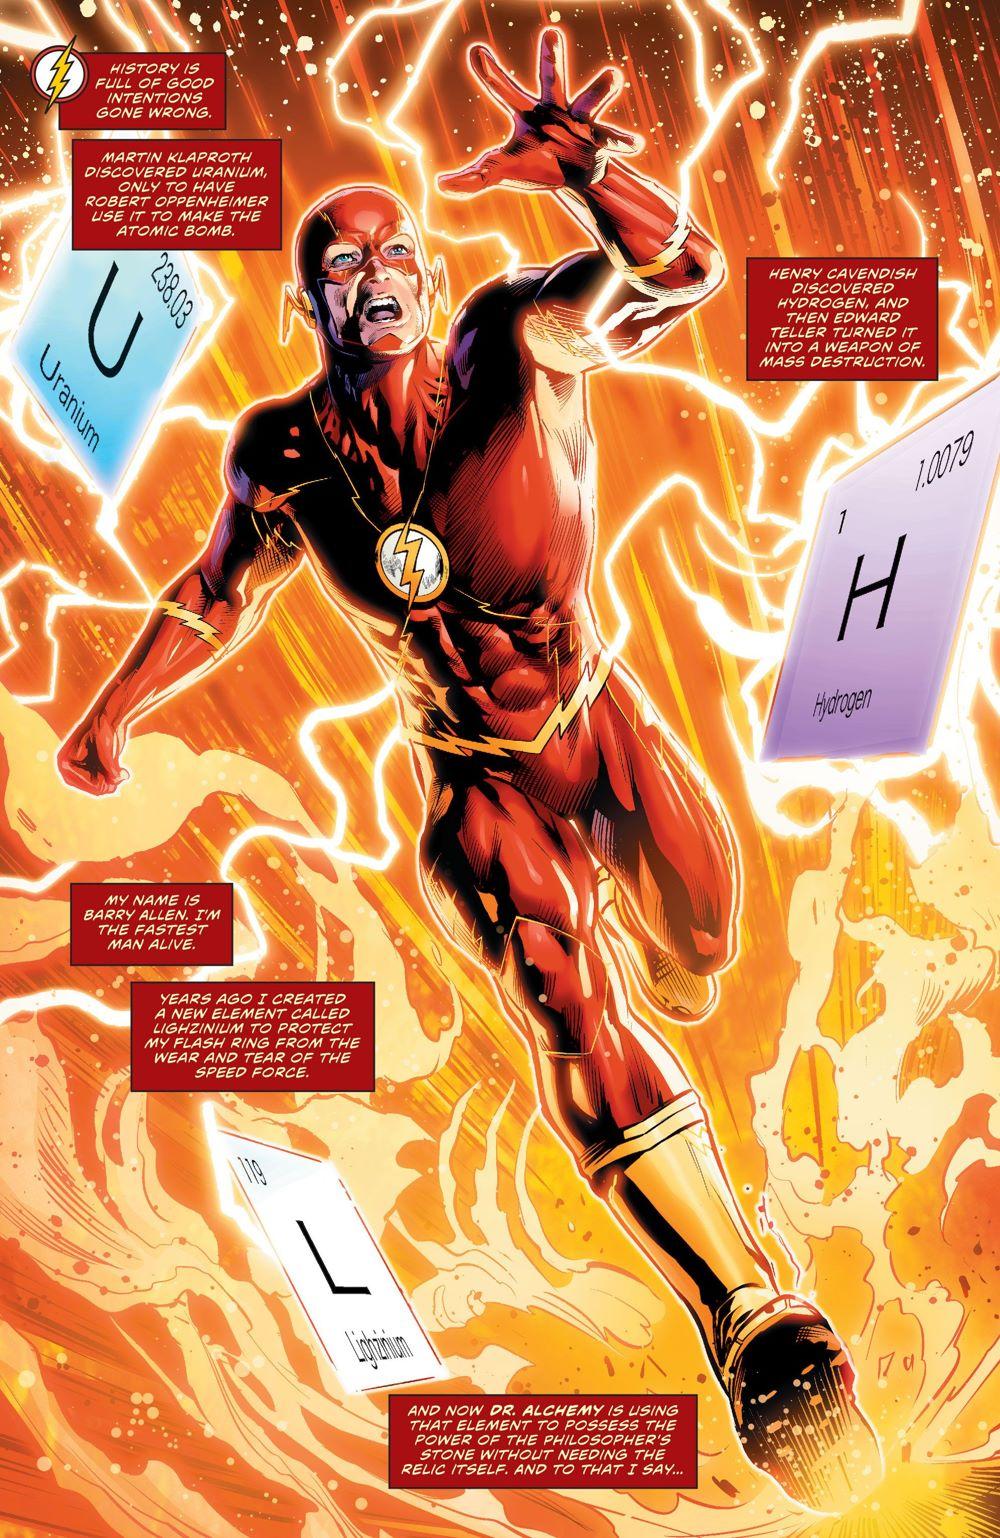 FLS-766-1 ComicList Previews: THE FLASH #766